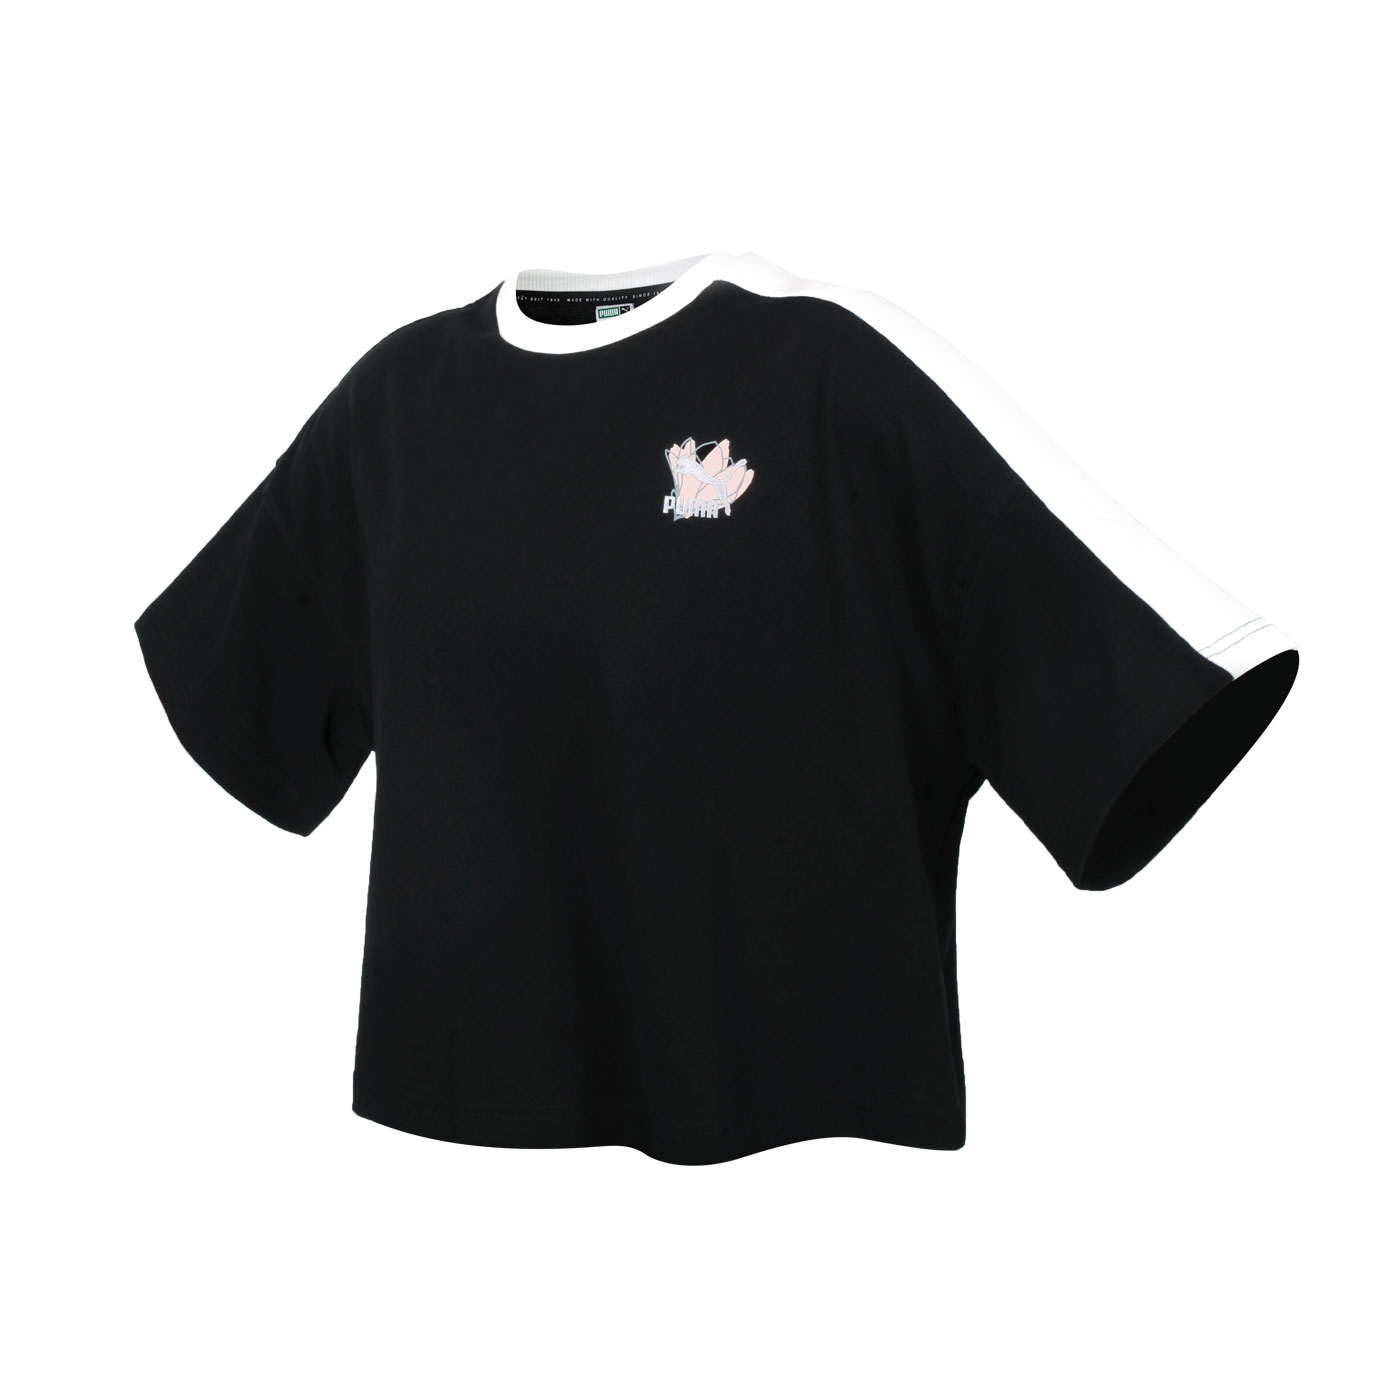 PUMA 女款Floral短袖T恤 53225801